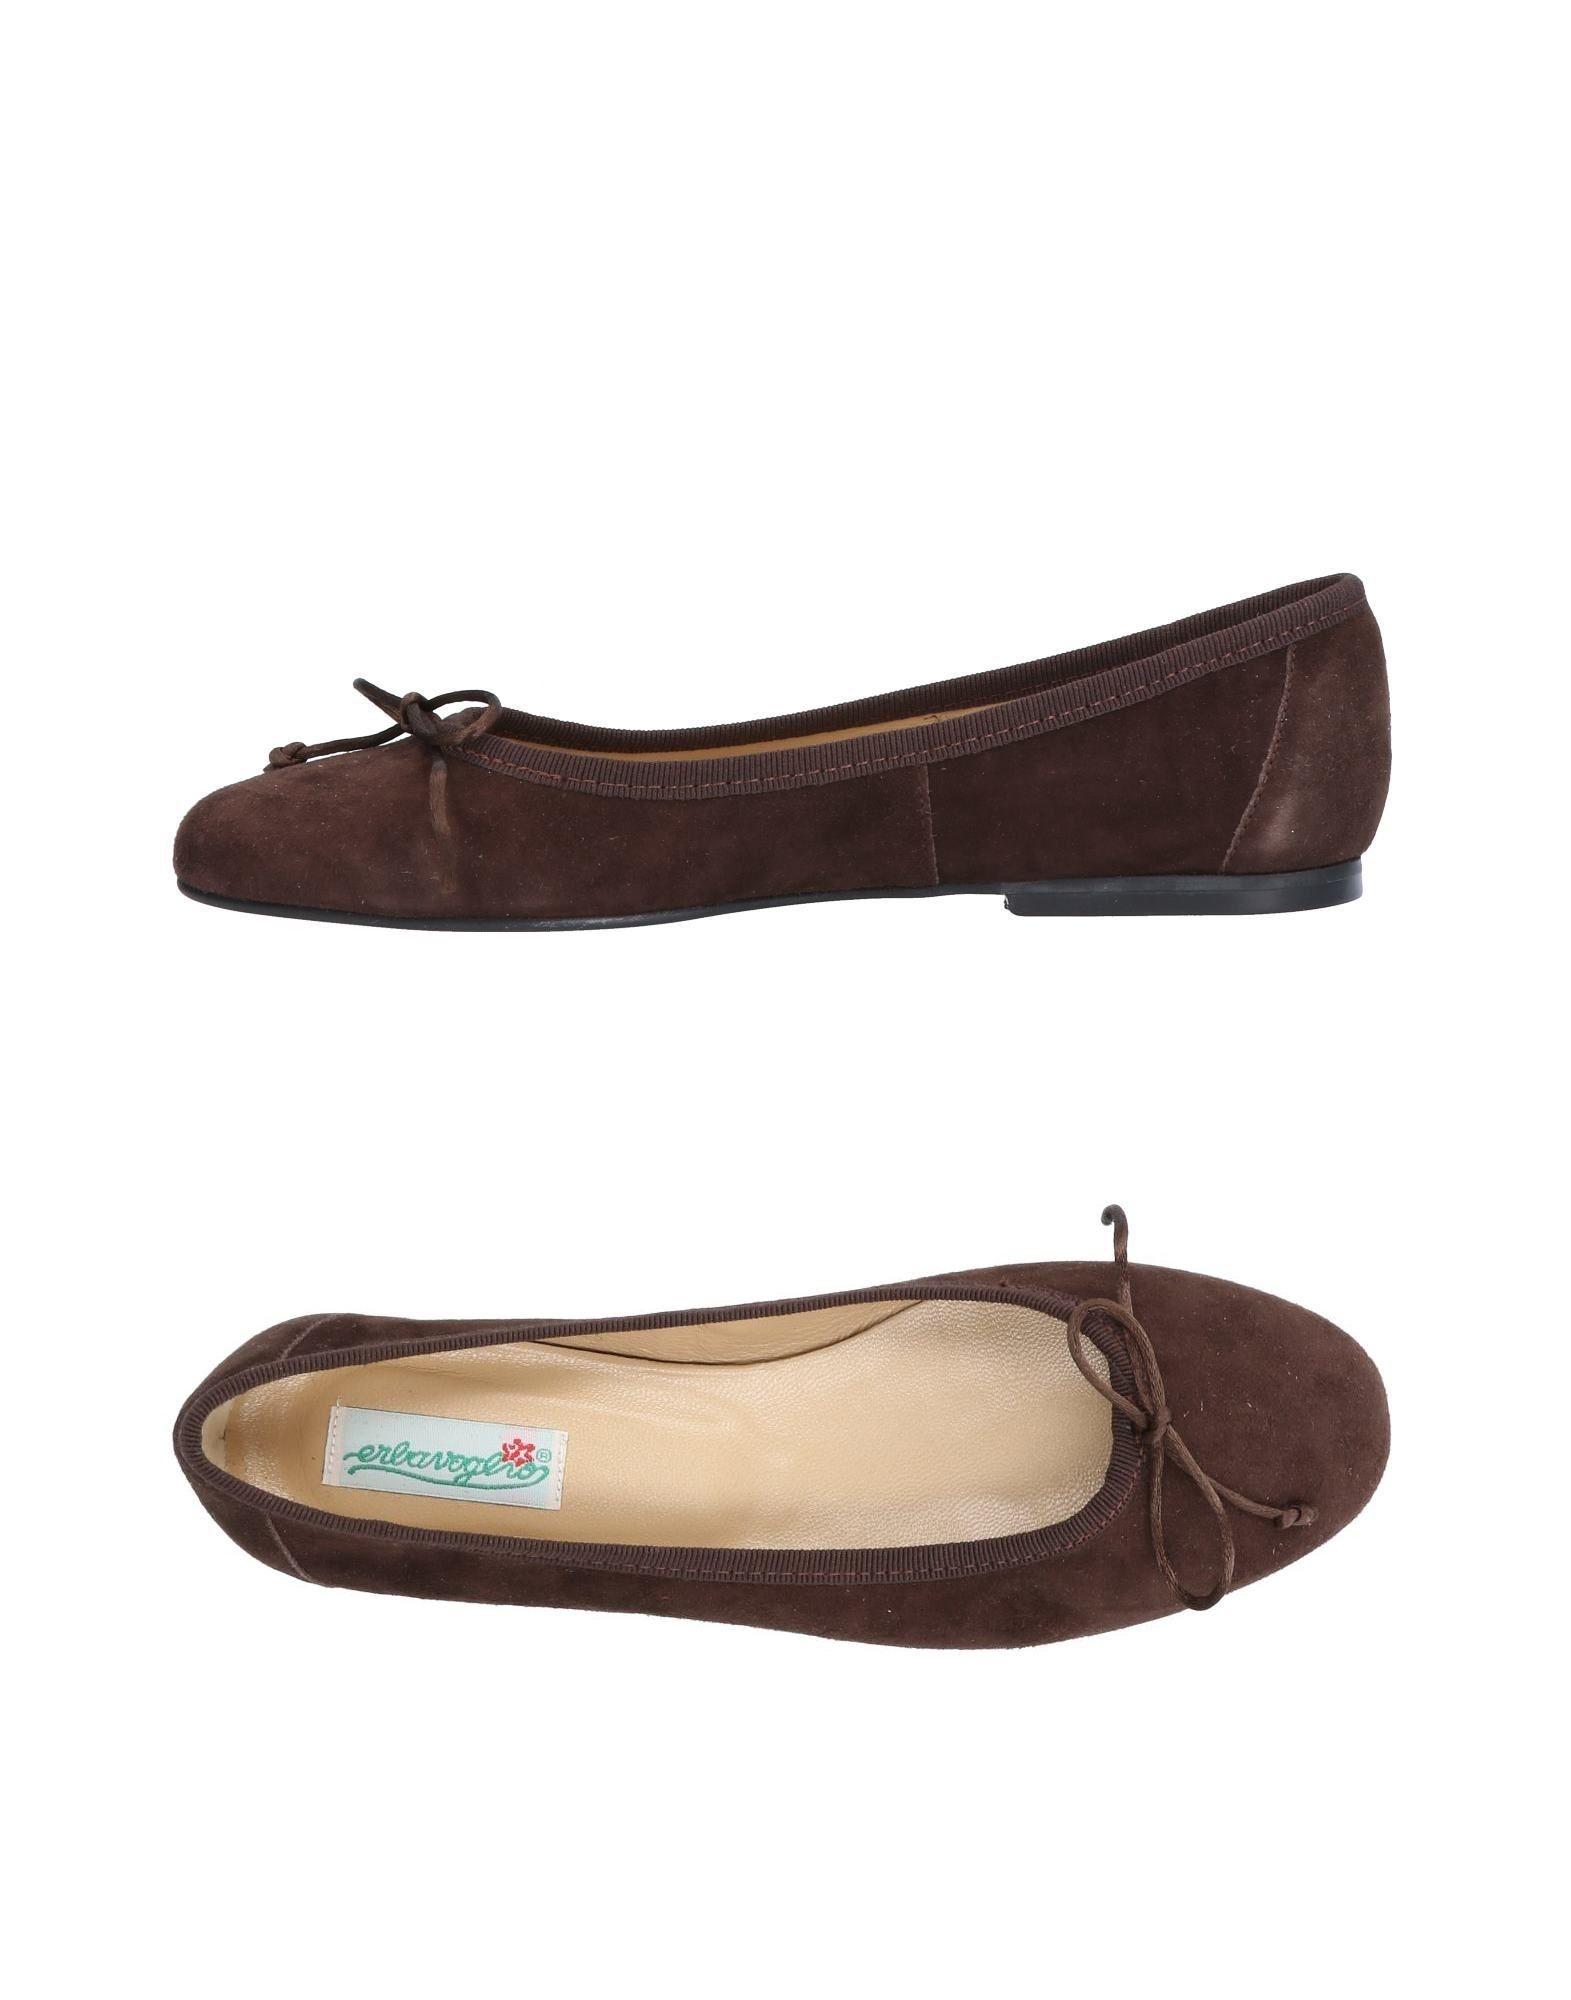 Ballerine Keys Donna e - 11552445SJ Nuove offerte e Donna scarpe comode 8b4fce